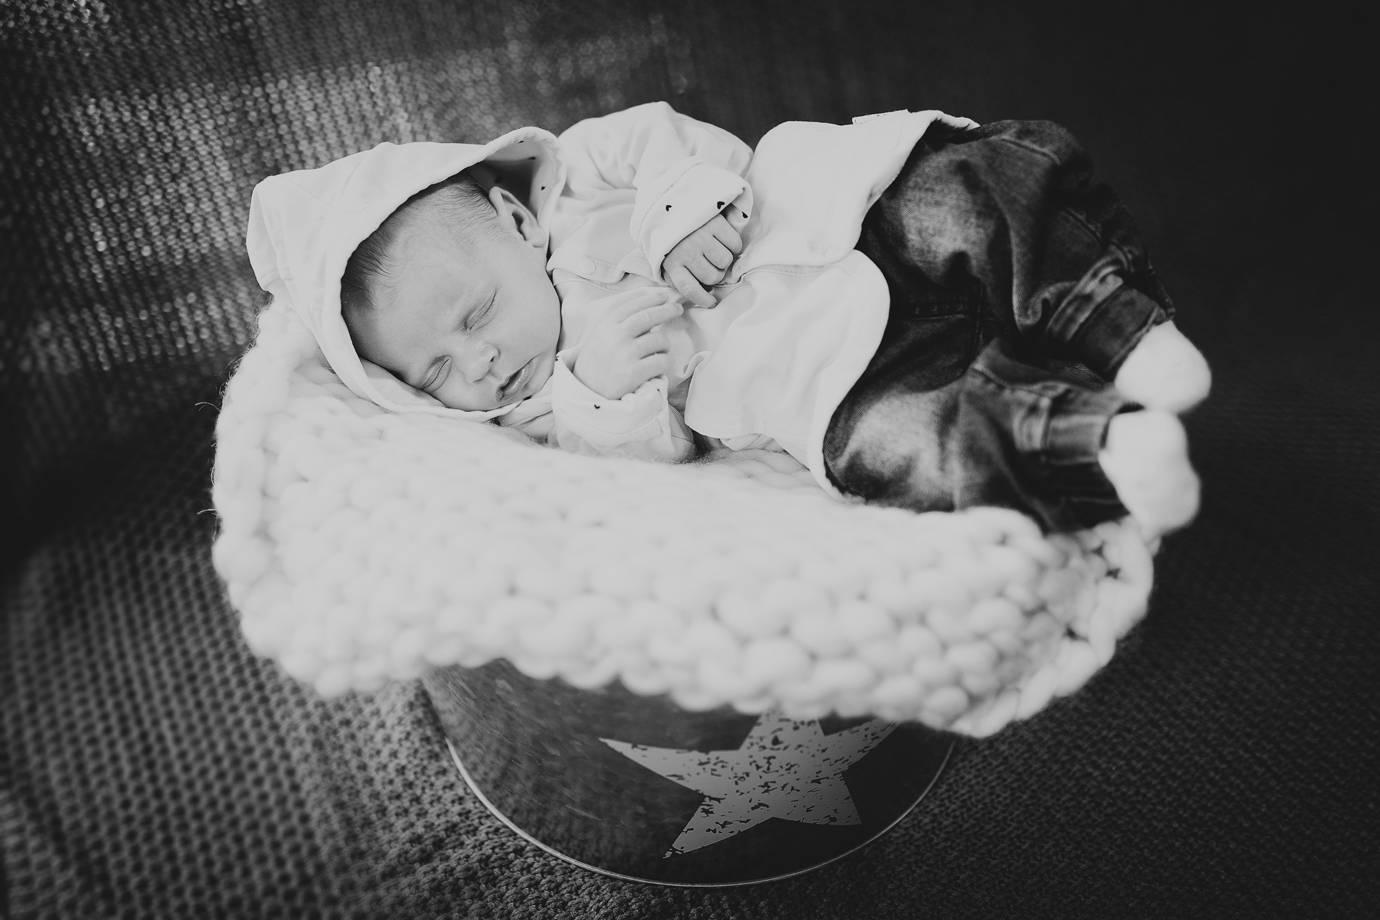 babyfotograf ritterhude 03 - Nika